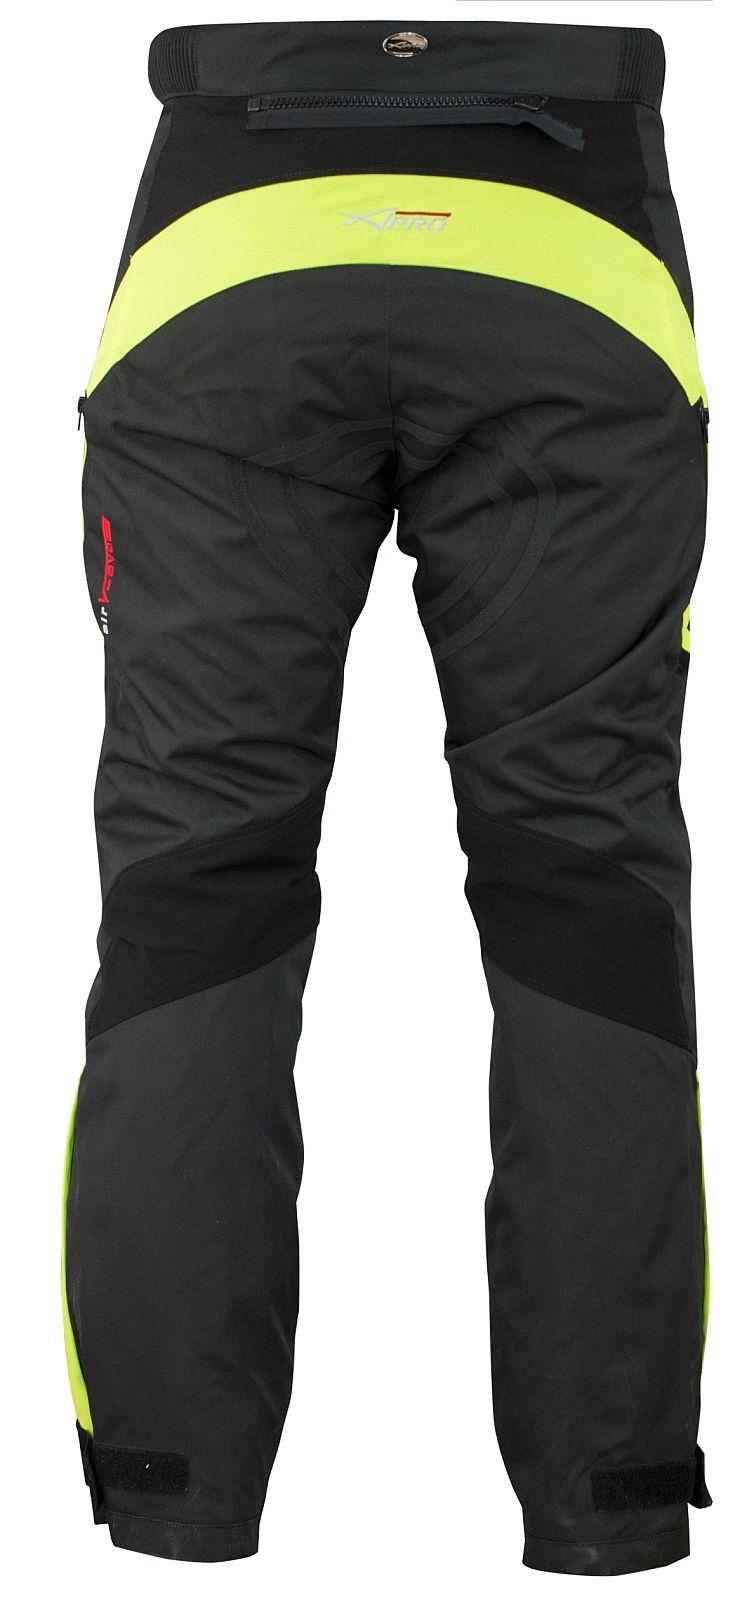 Pantaloni-Donna-Impermeabile-Moto-Imbottitura-Termica-Traspirante-Fluo miniatura 7